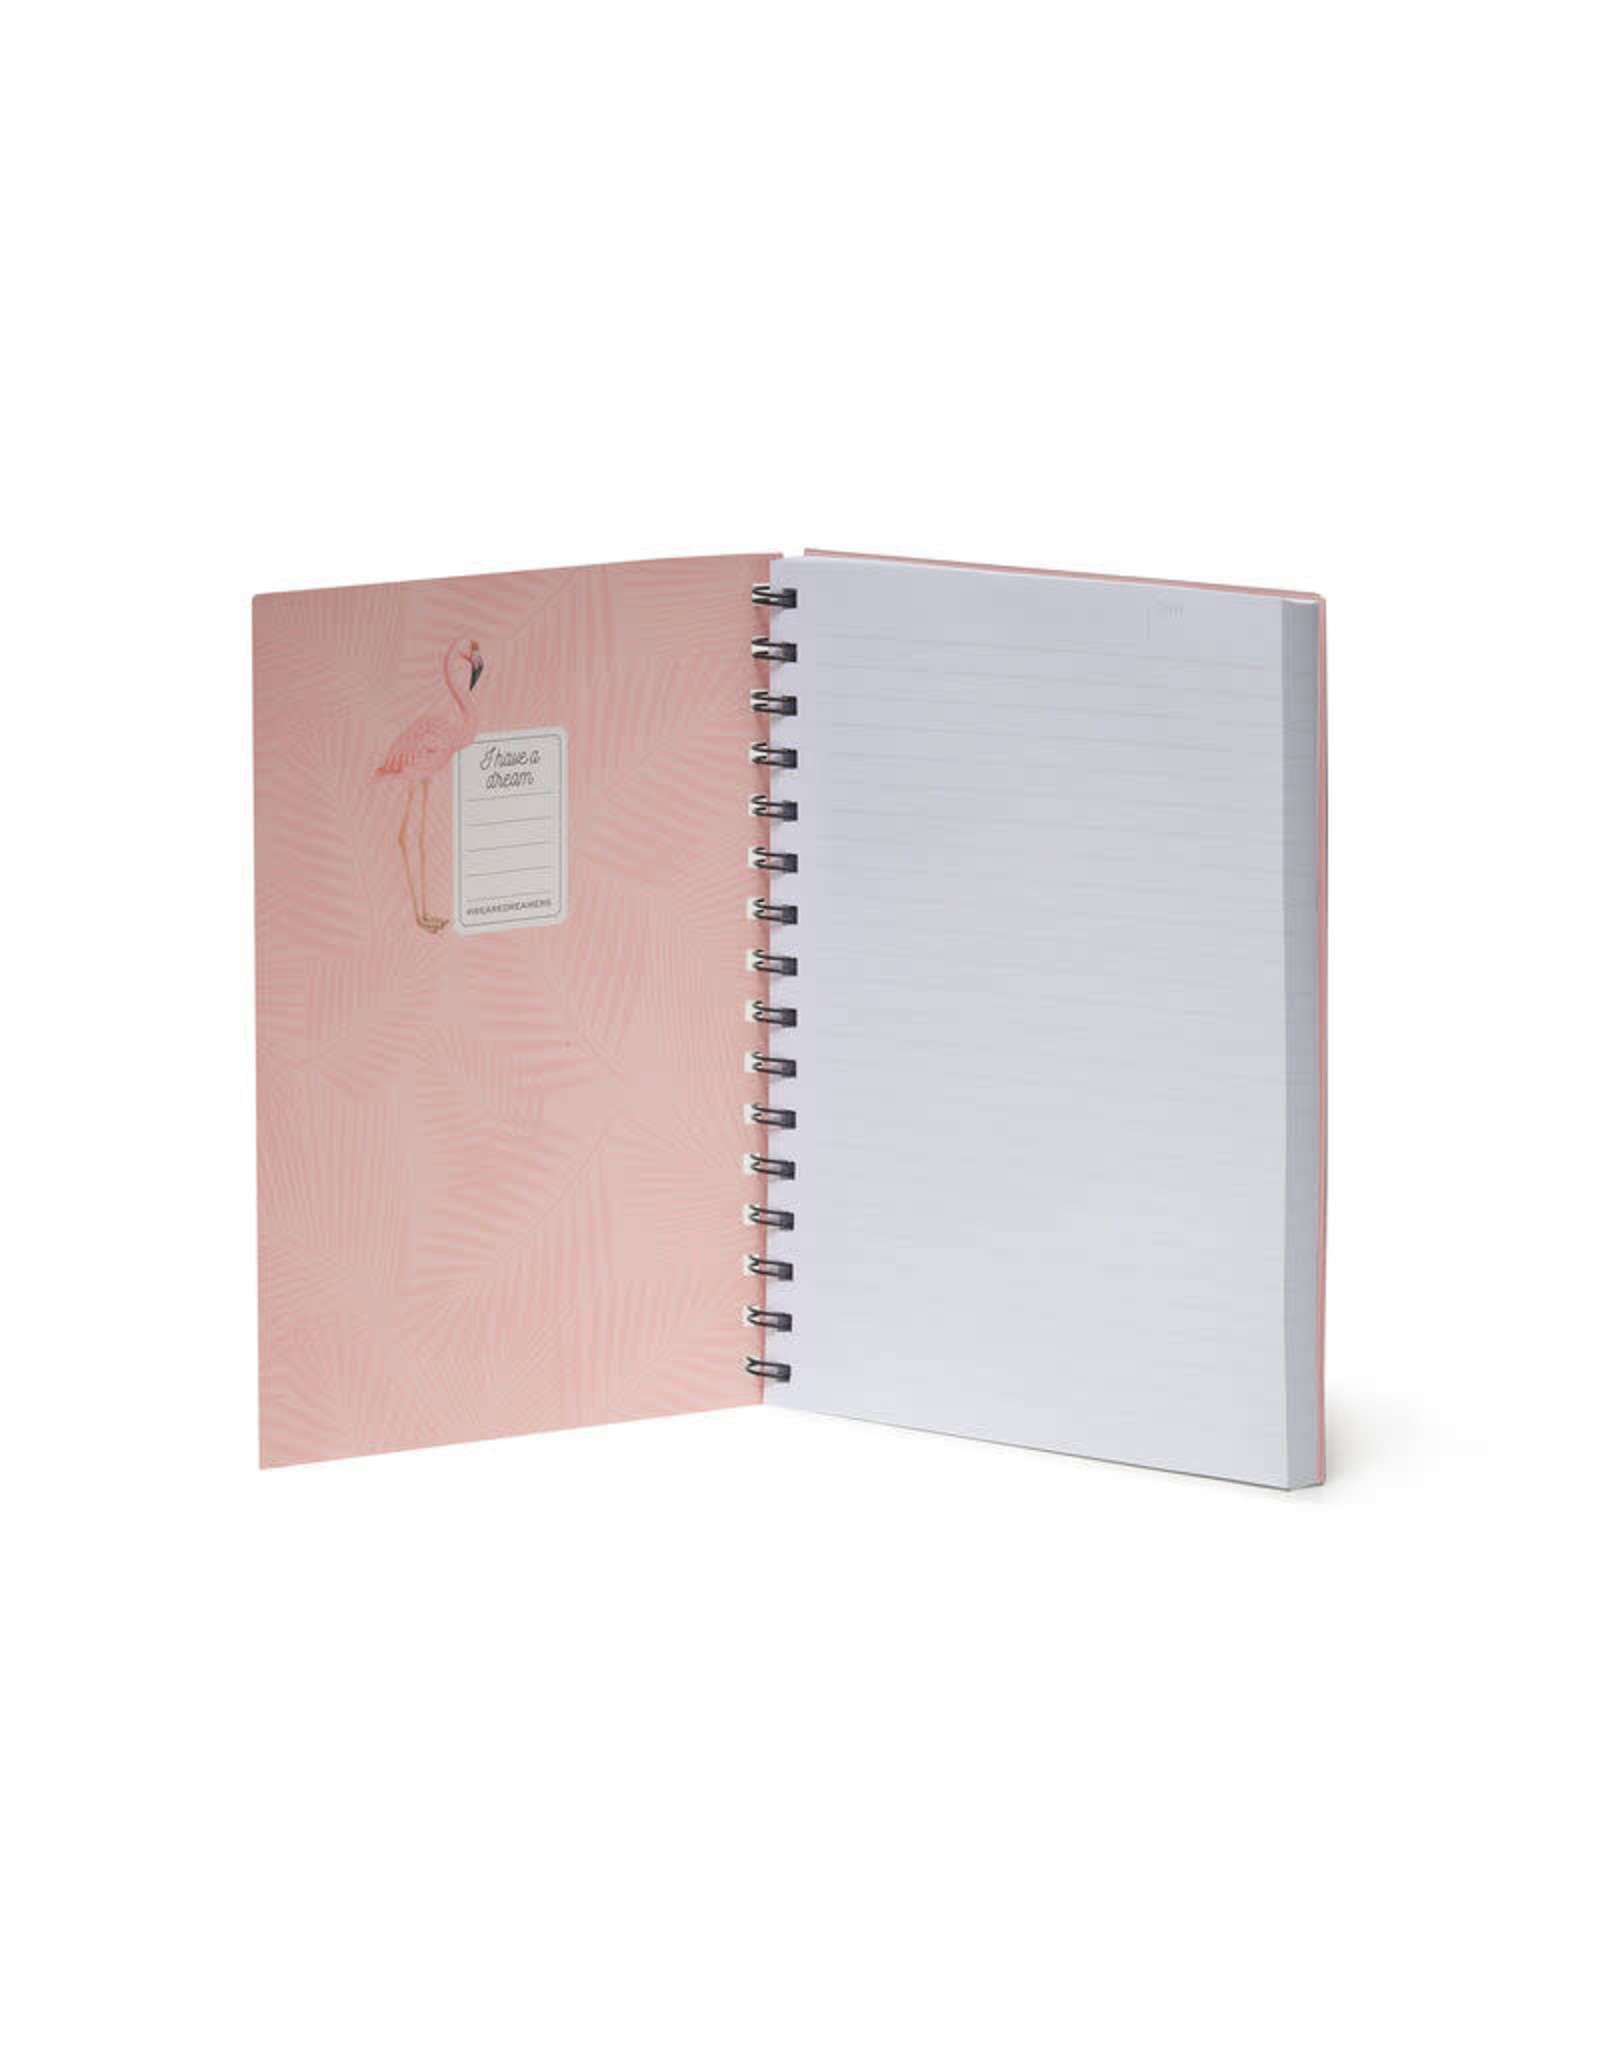 Notaboek spiraal A5 flamingo